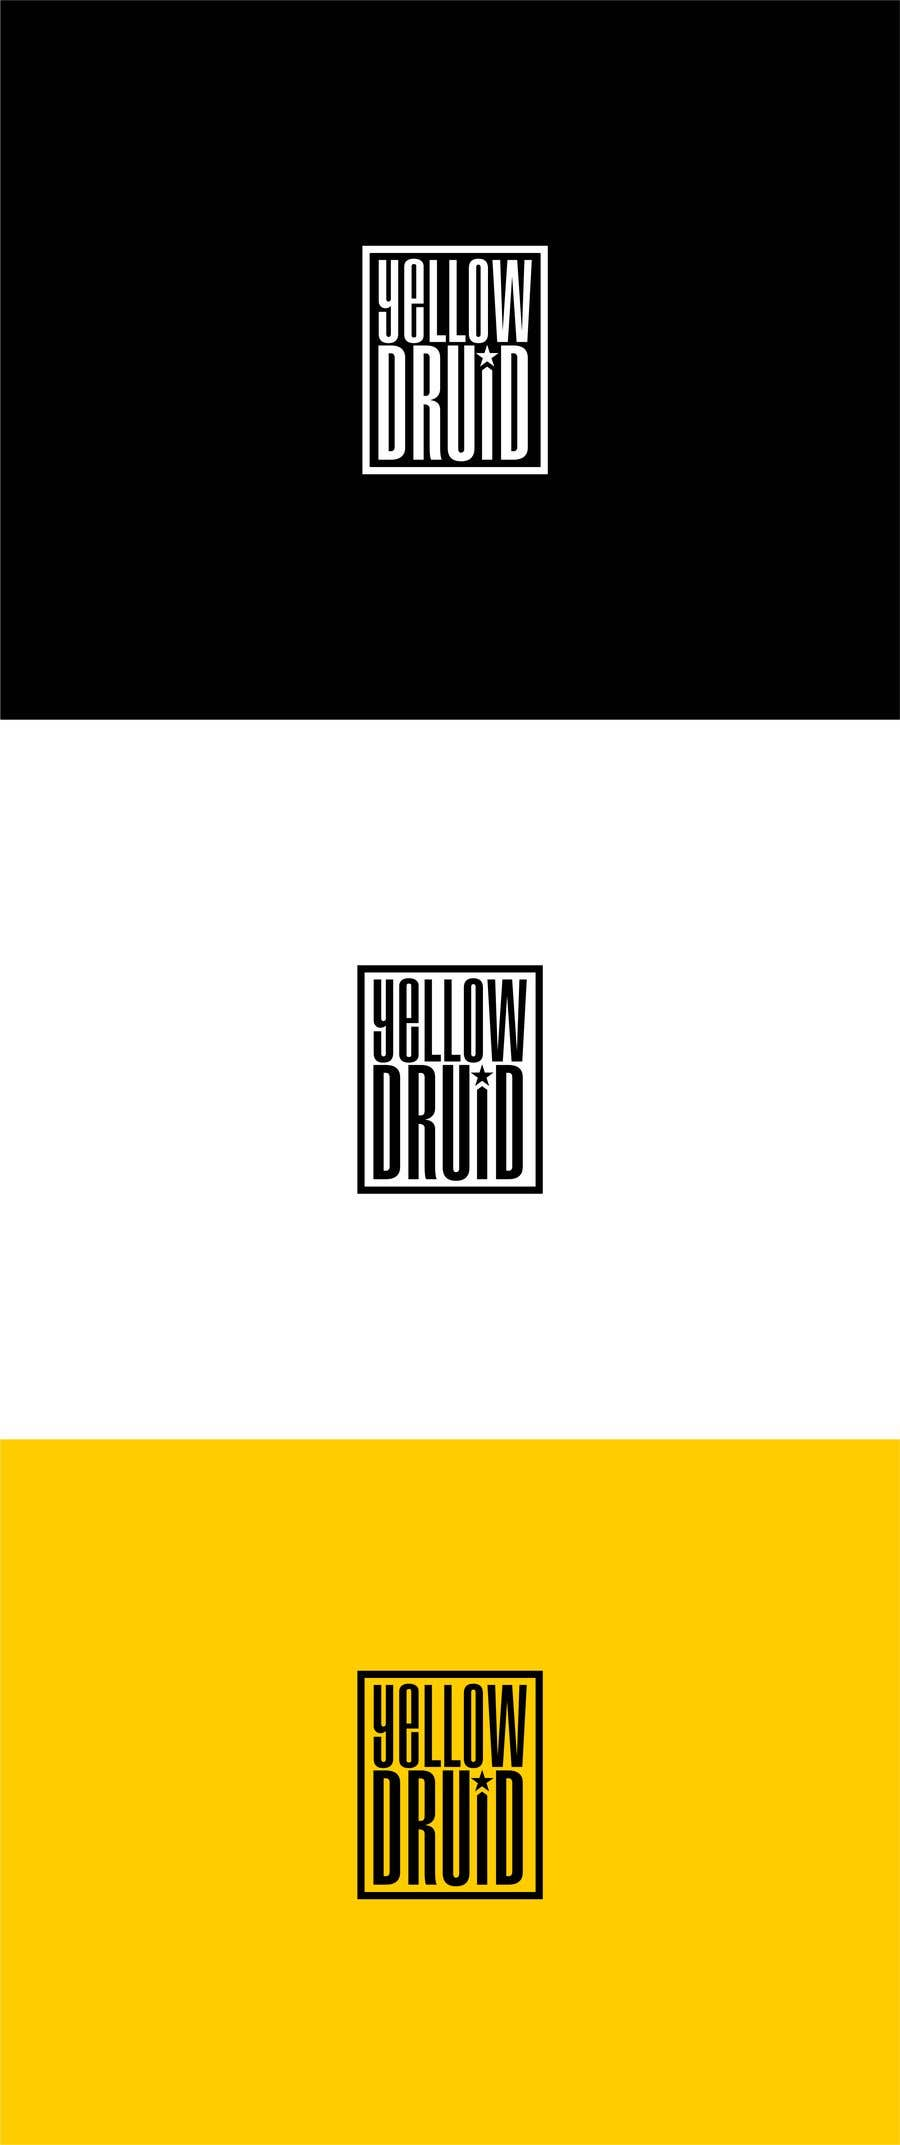 Contest Entry #343 for Design a Logo for a Musician